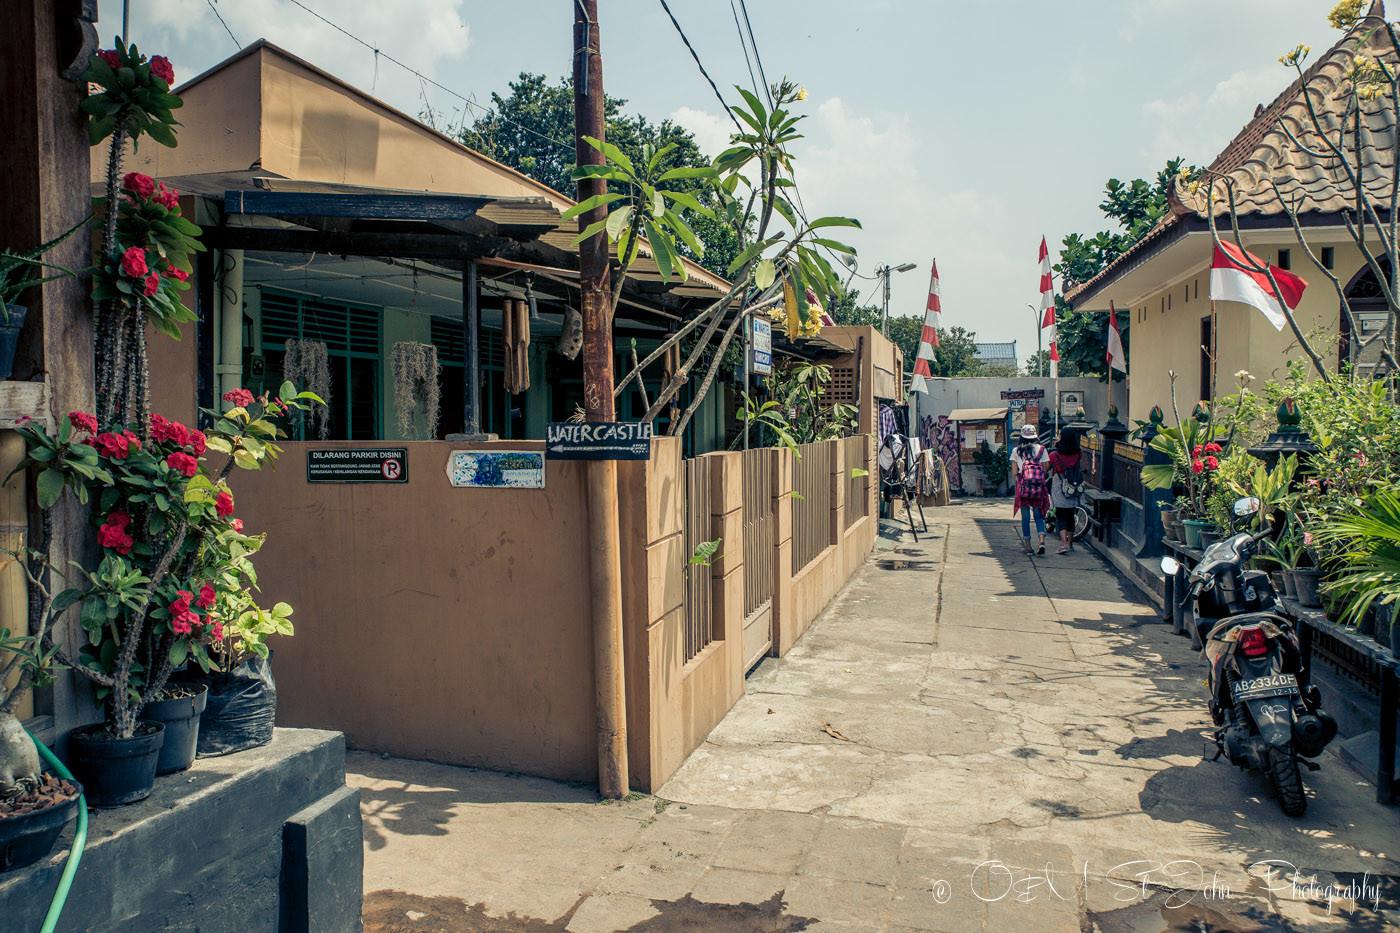 yogyakarta attractions: Small street near Taman Sari